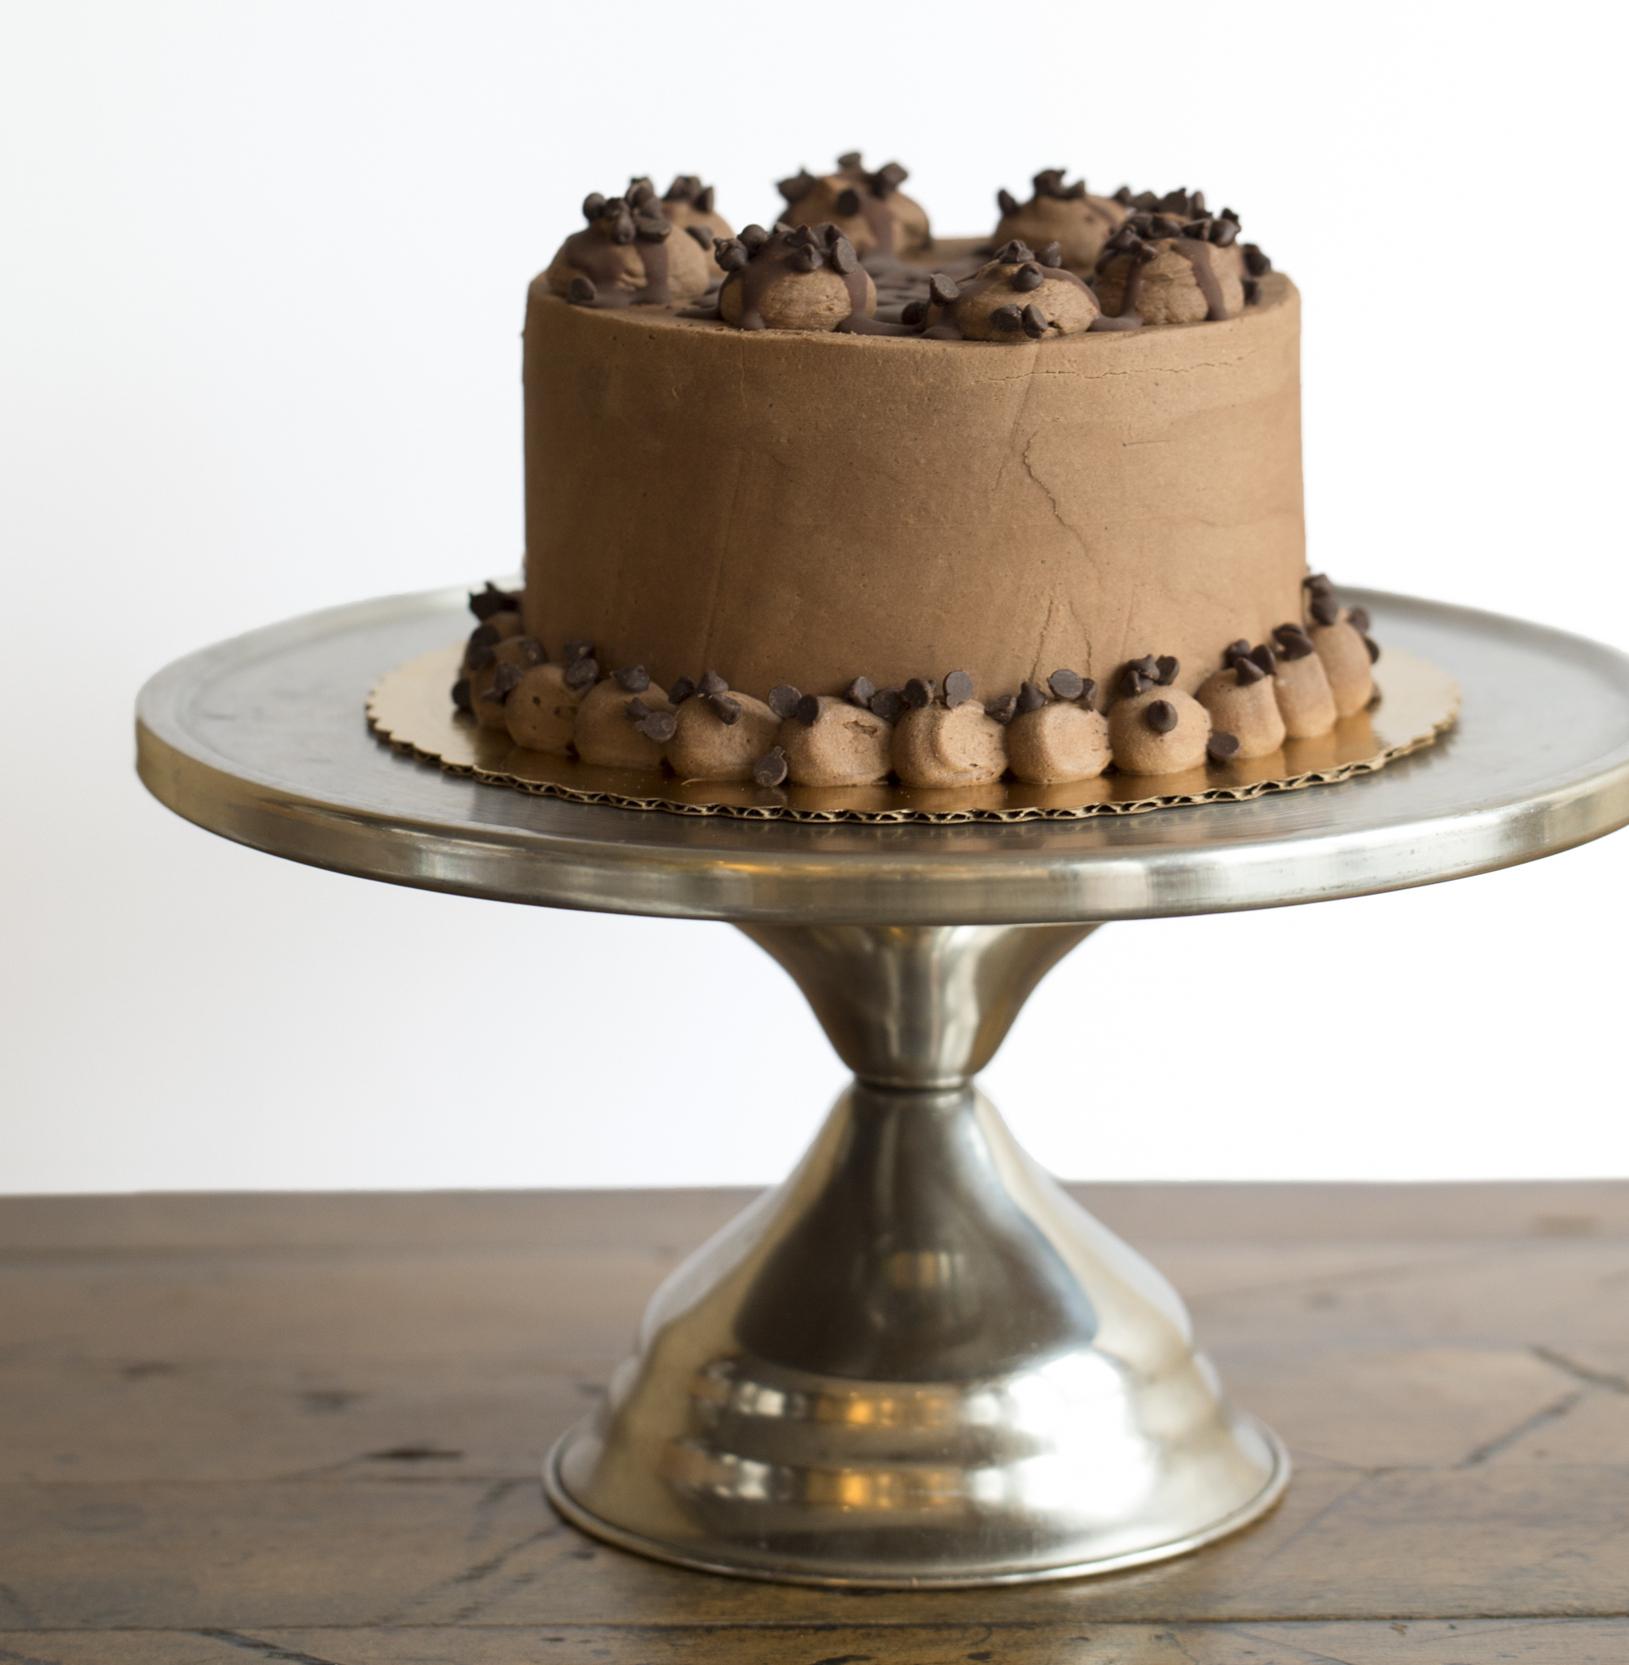 death-by-chocolate-cake-white-crop.jpg